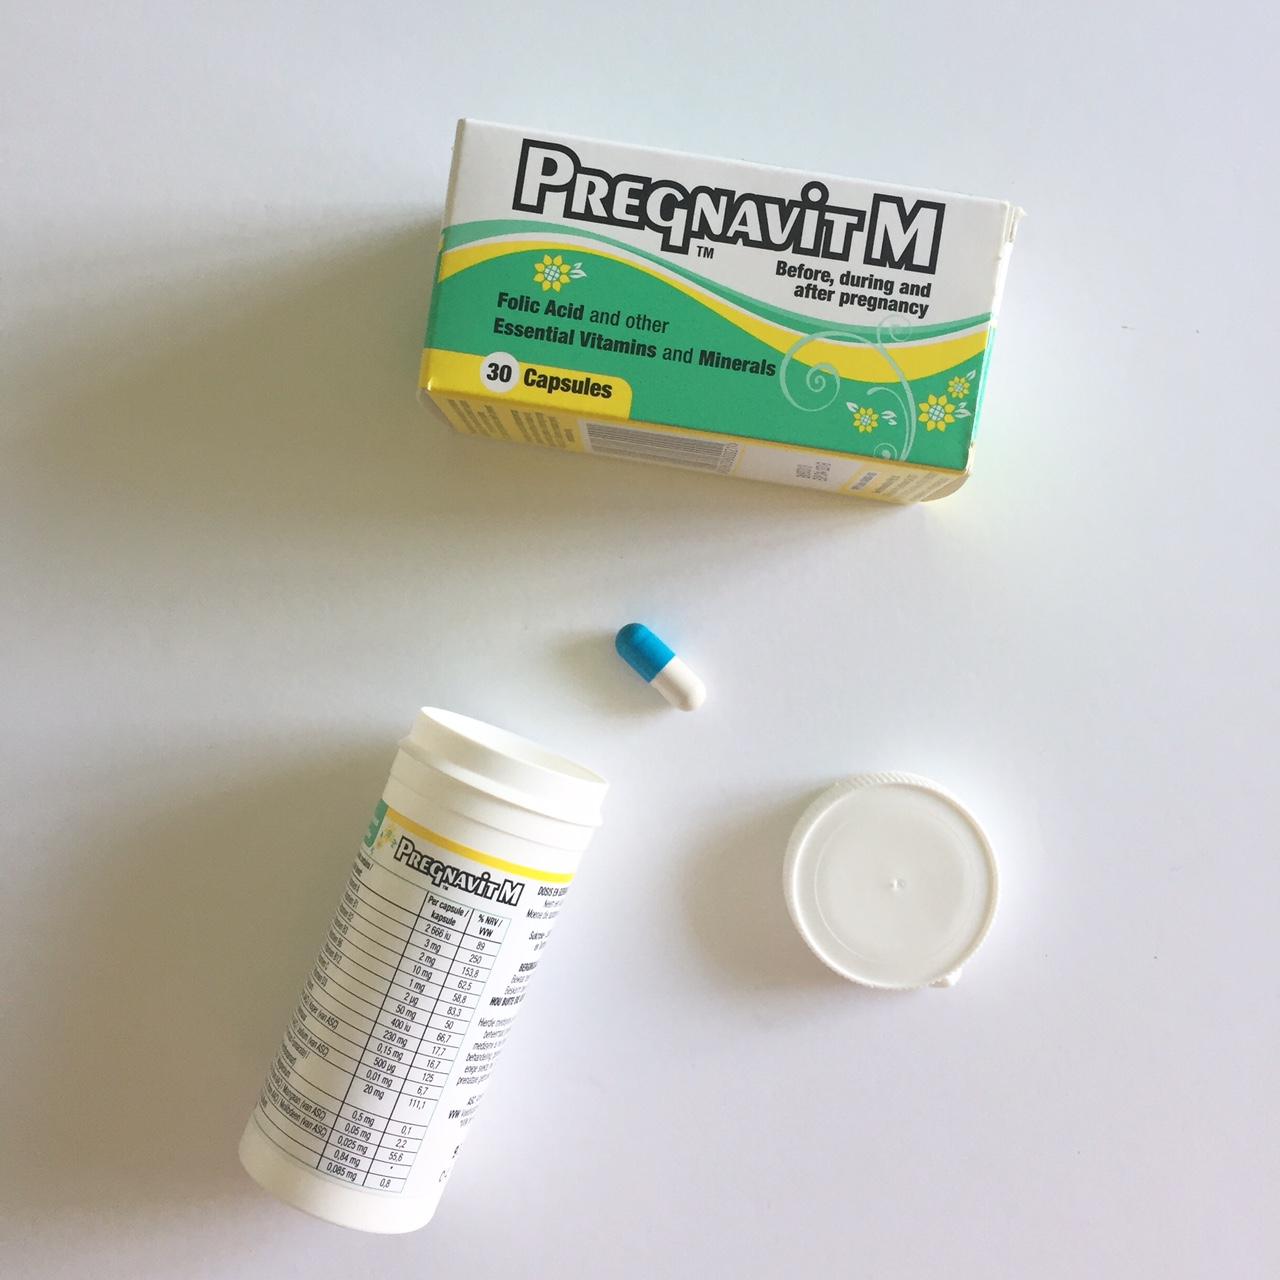 Pregnavit prenatal vitamin south africa, what vitamins to take when pregnant, pregnant mulitvitmain